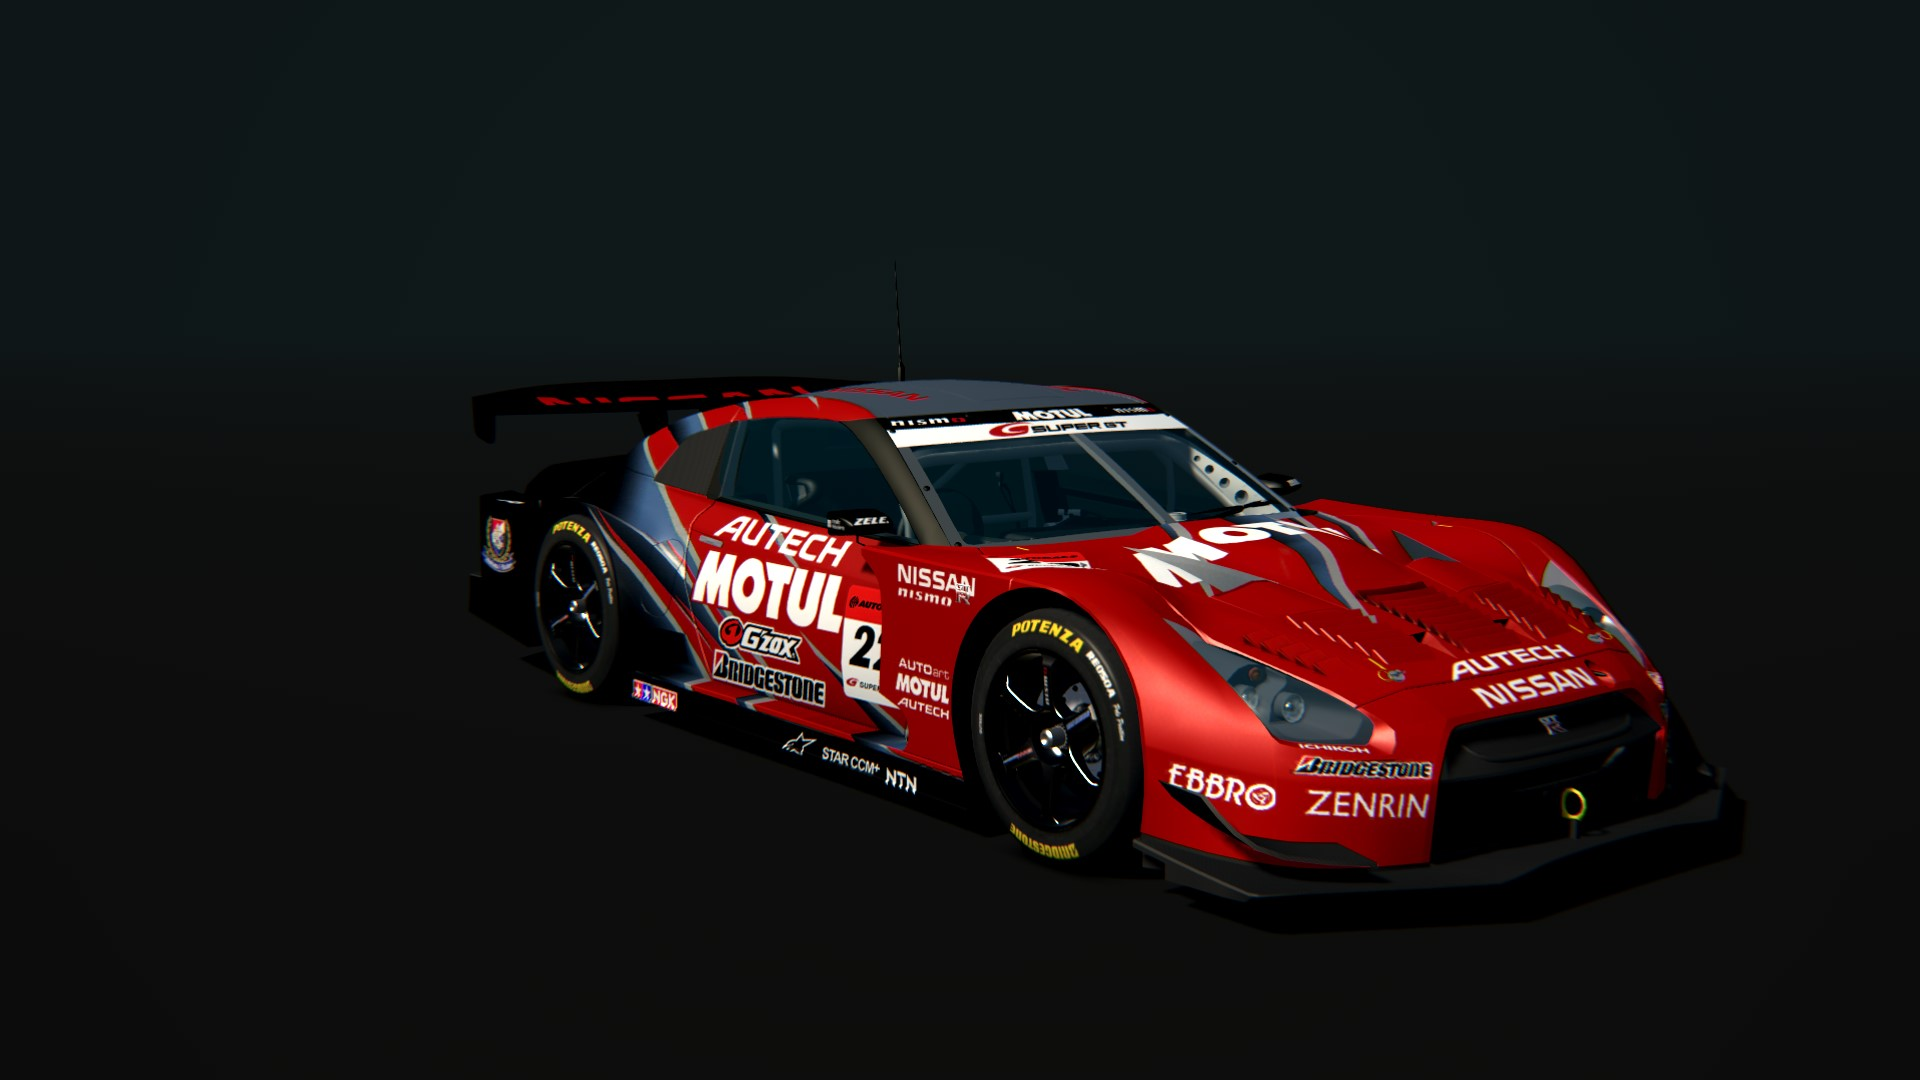 Nissan GTR GT500 - Nissan - Car Detail - Assetto Corsa Database